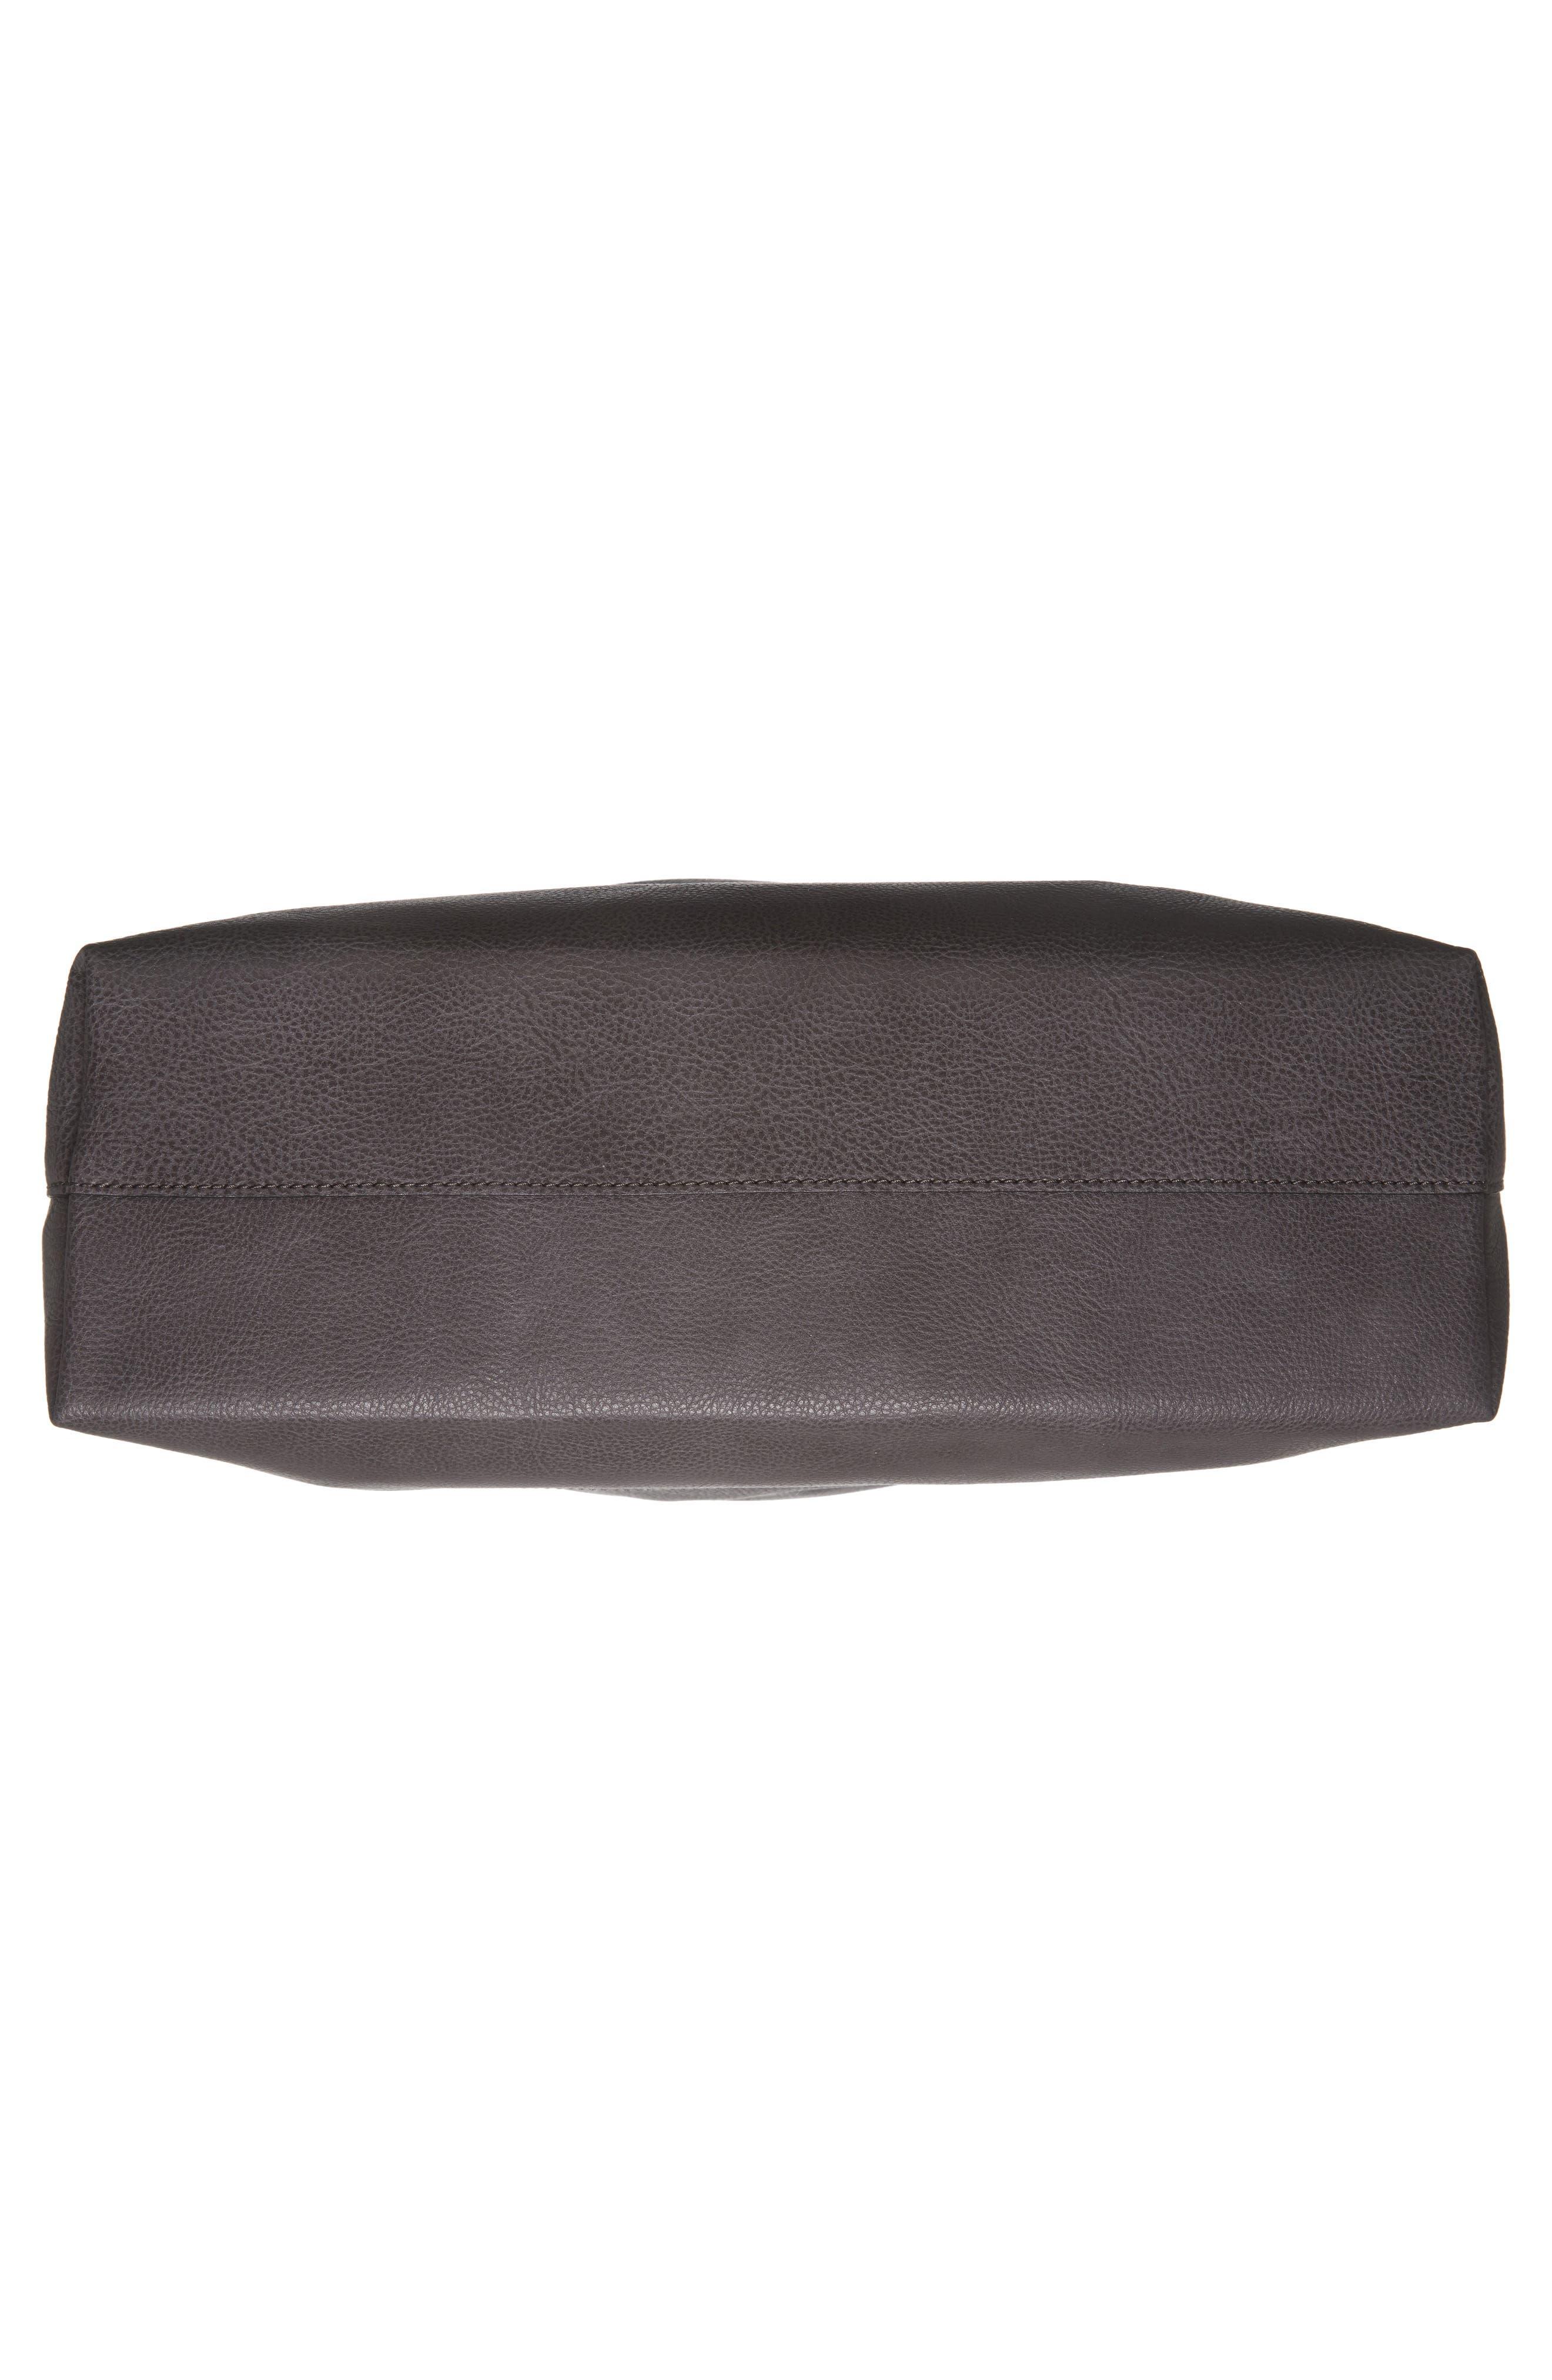 Alternate Image 5  - Sole Society Dawson Oversize Faux Leather Shopper